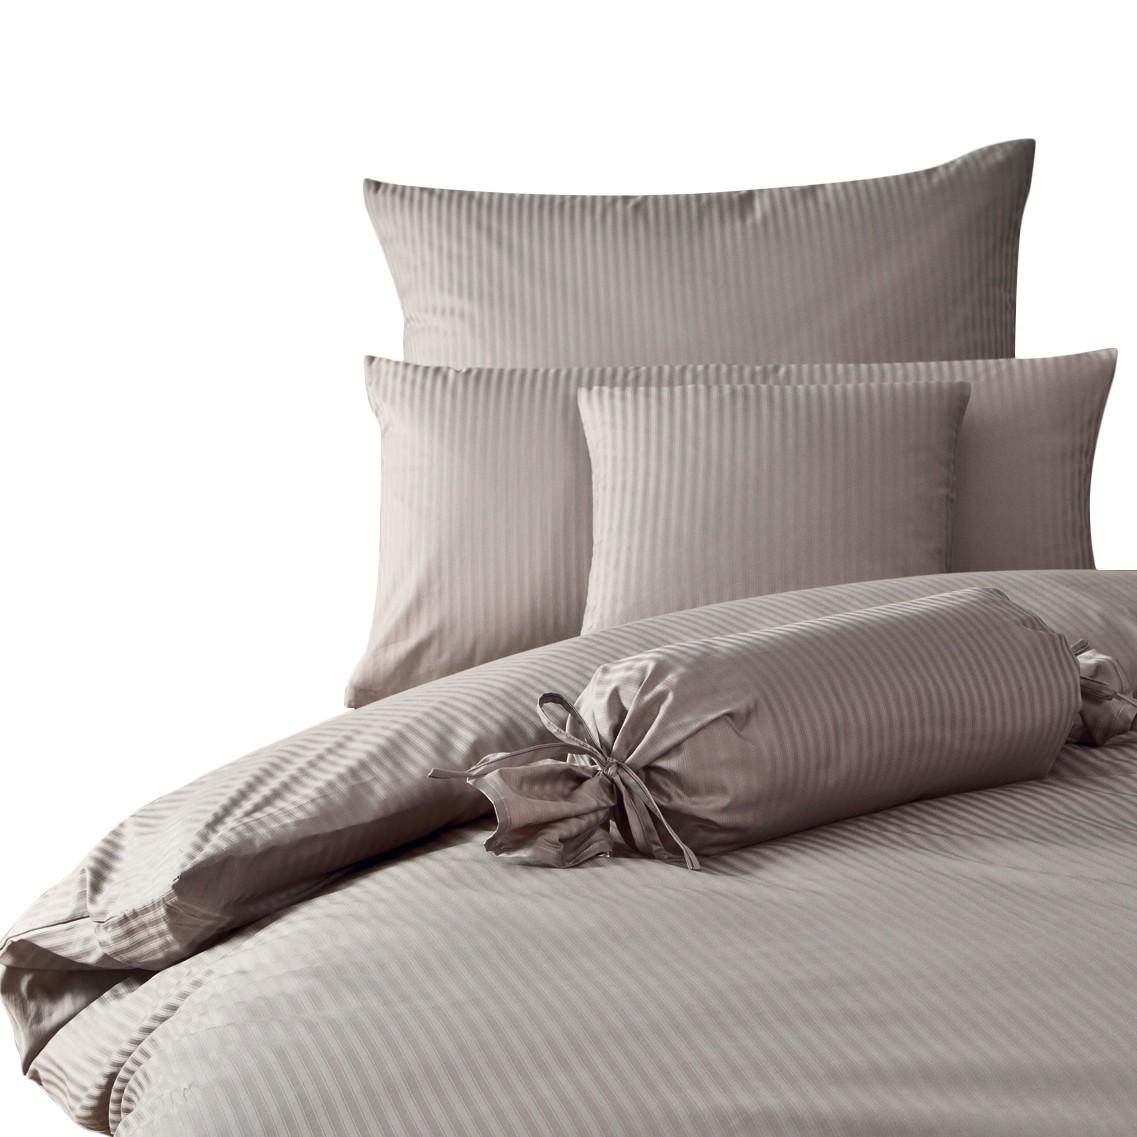 rubin streifen taubengrau 200 x 220 cm kissen 80 x 80 cm janine. Black Bedroom Furniture Sets. Home Design Ideas